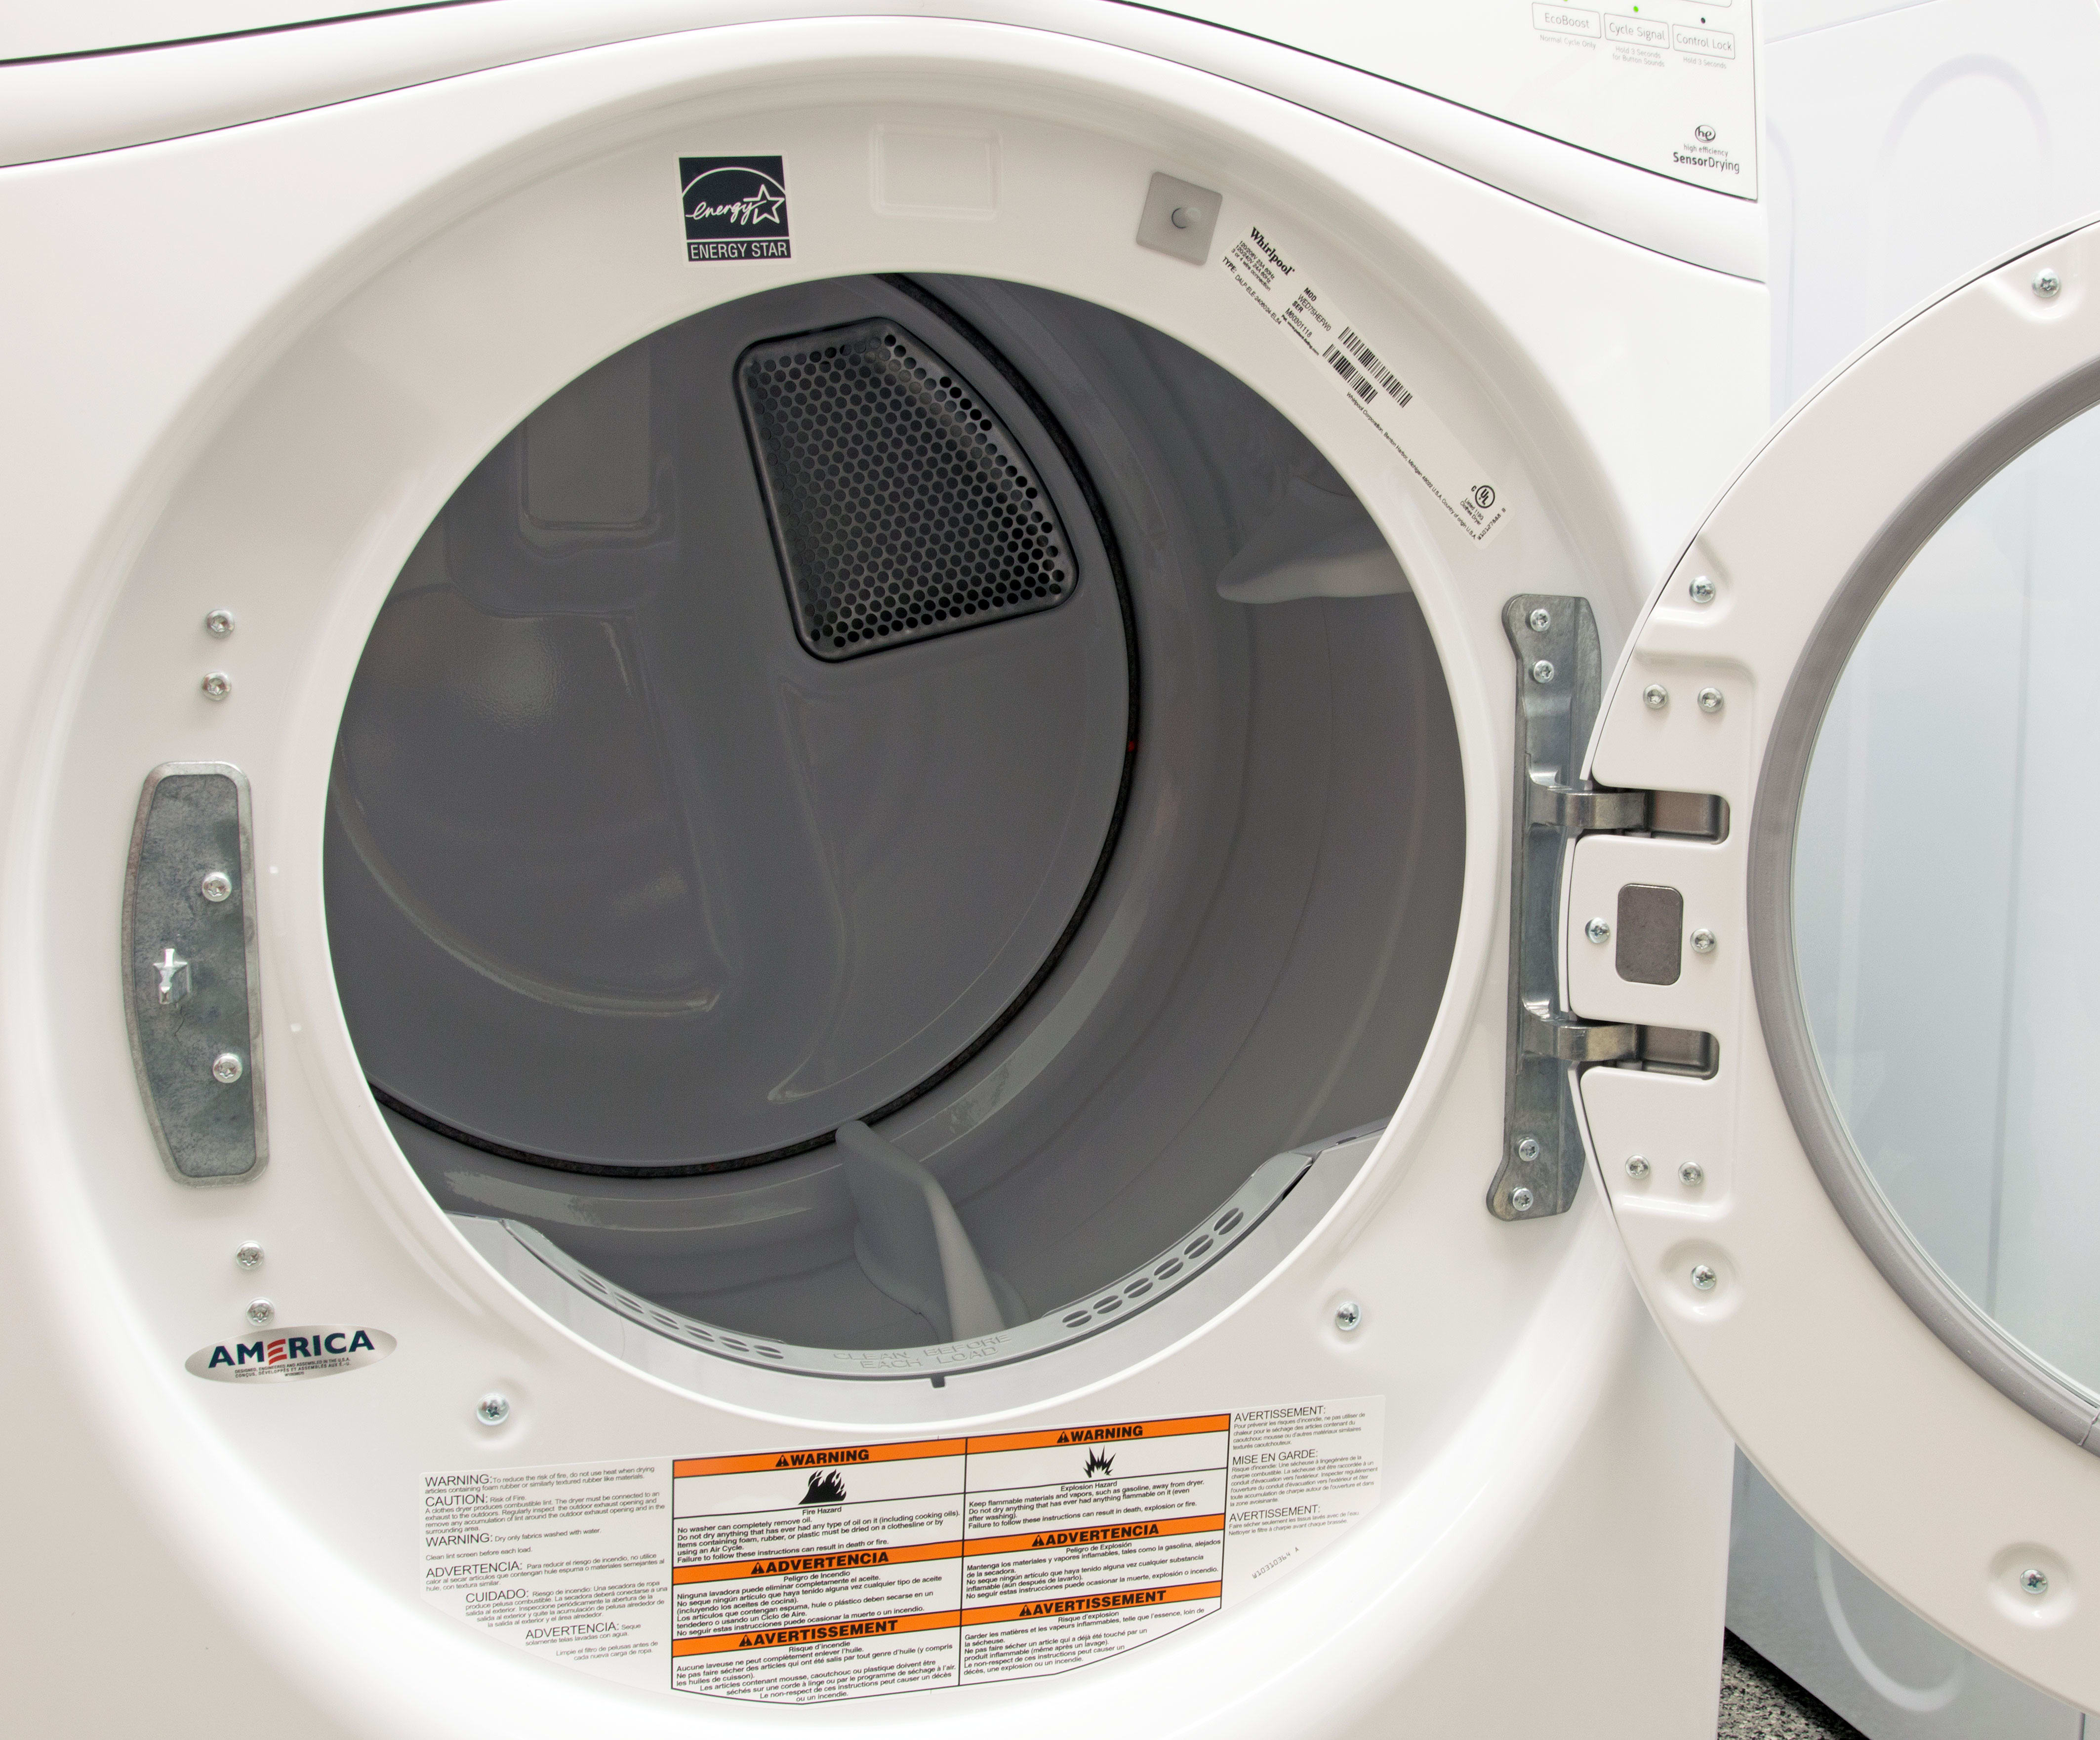 Whirlpool Bad Vergelijk : Whirlpool wed hefw wgd hefw series dryer review reviewed laundry